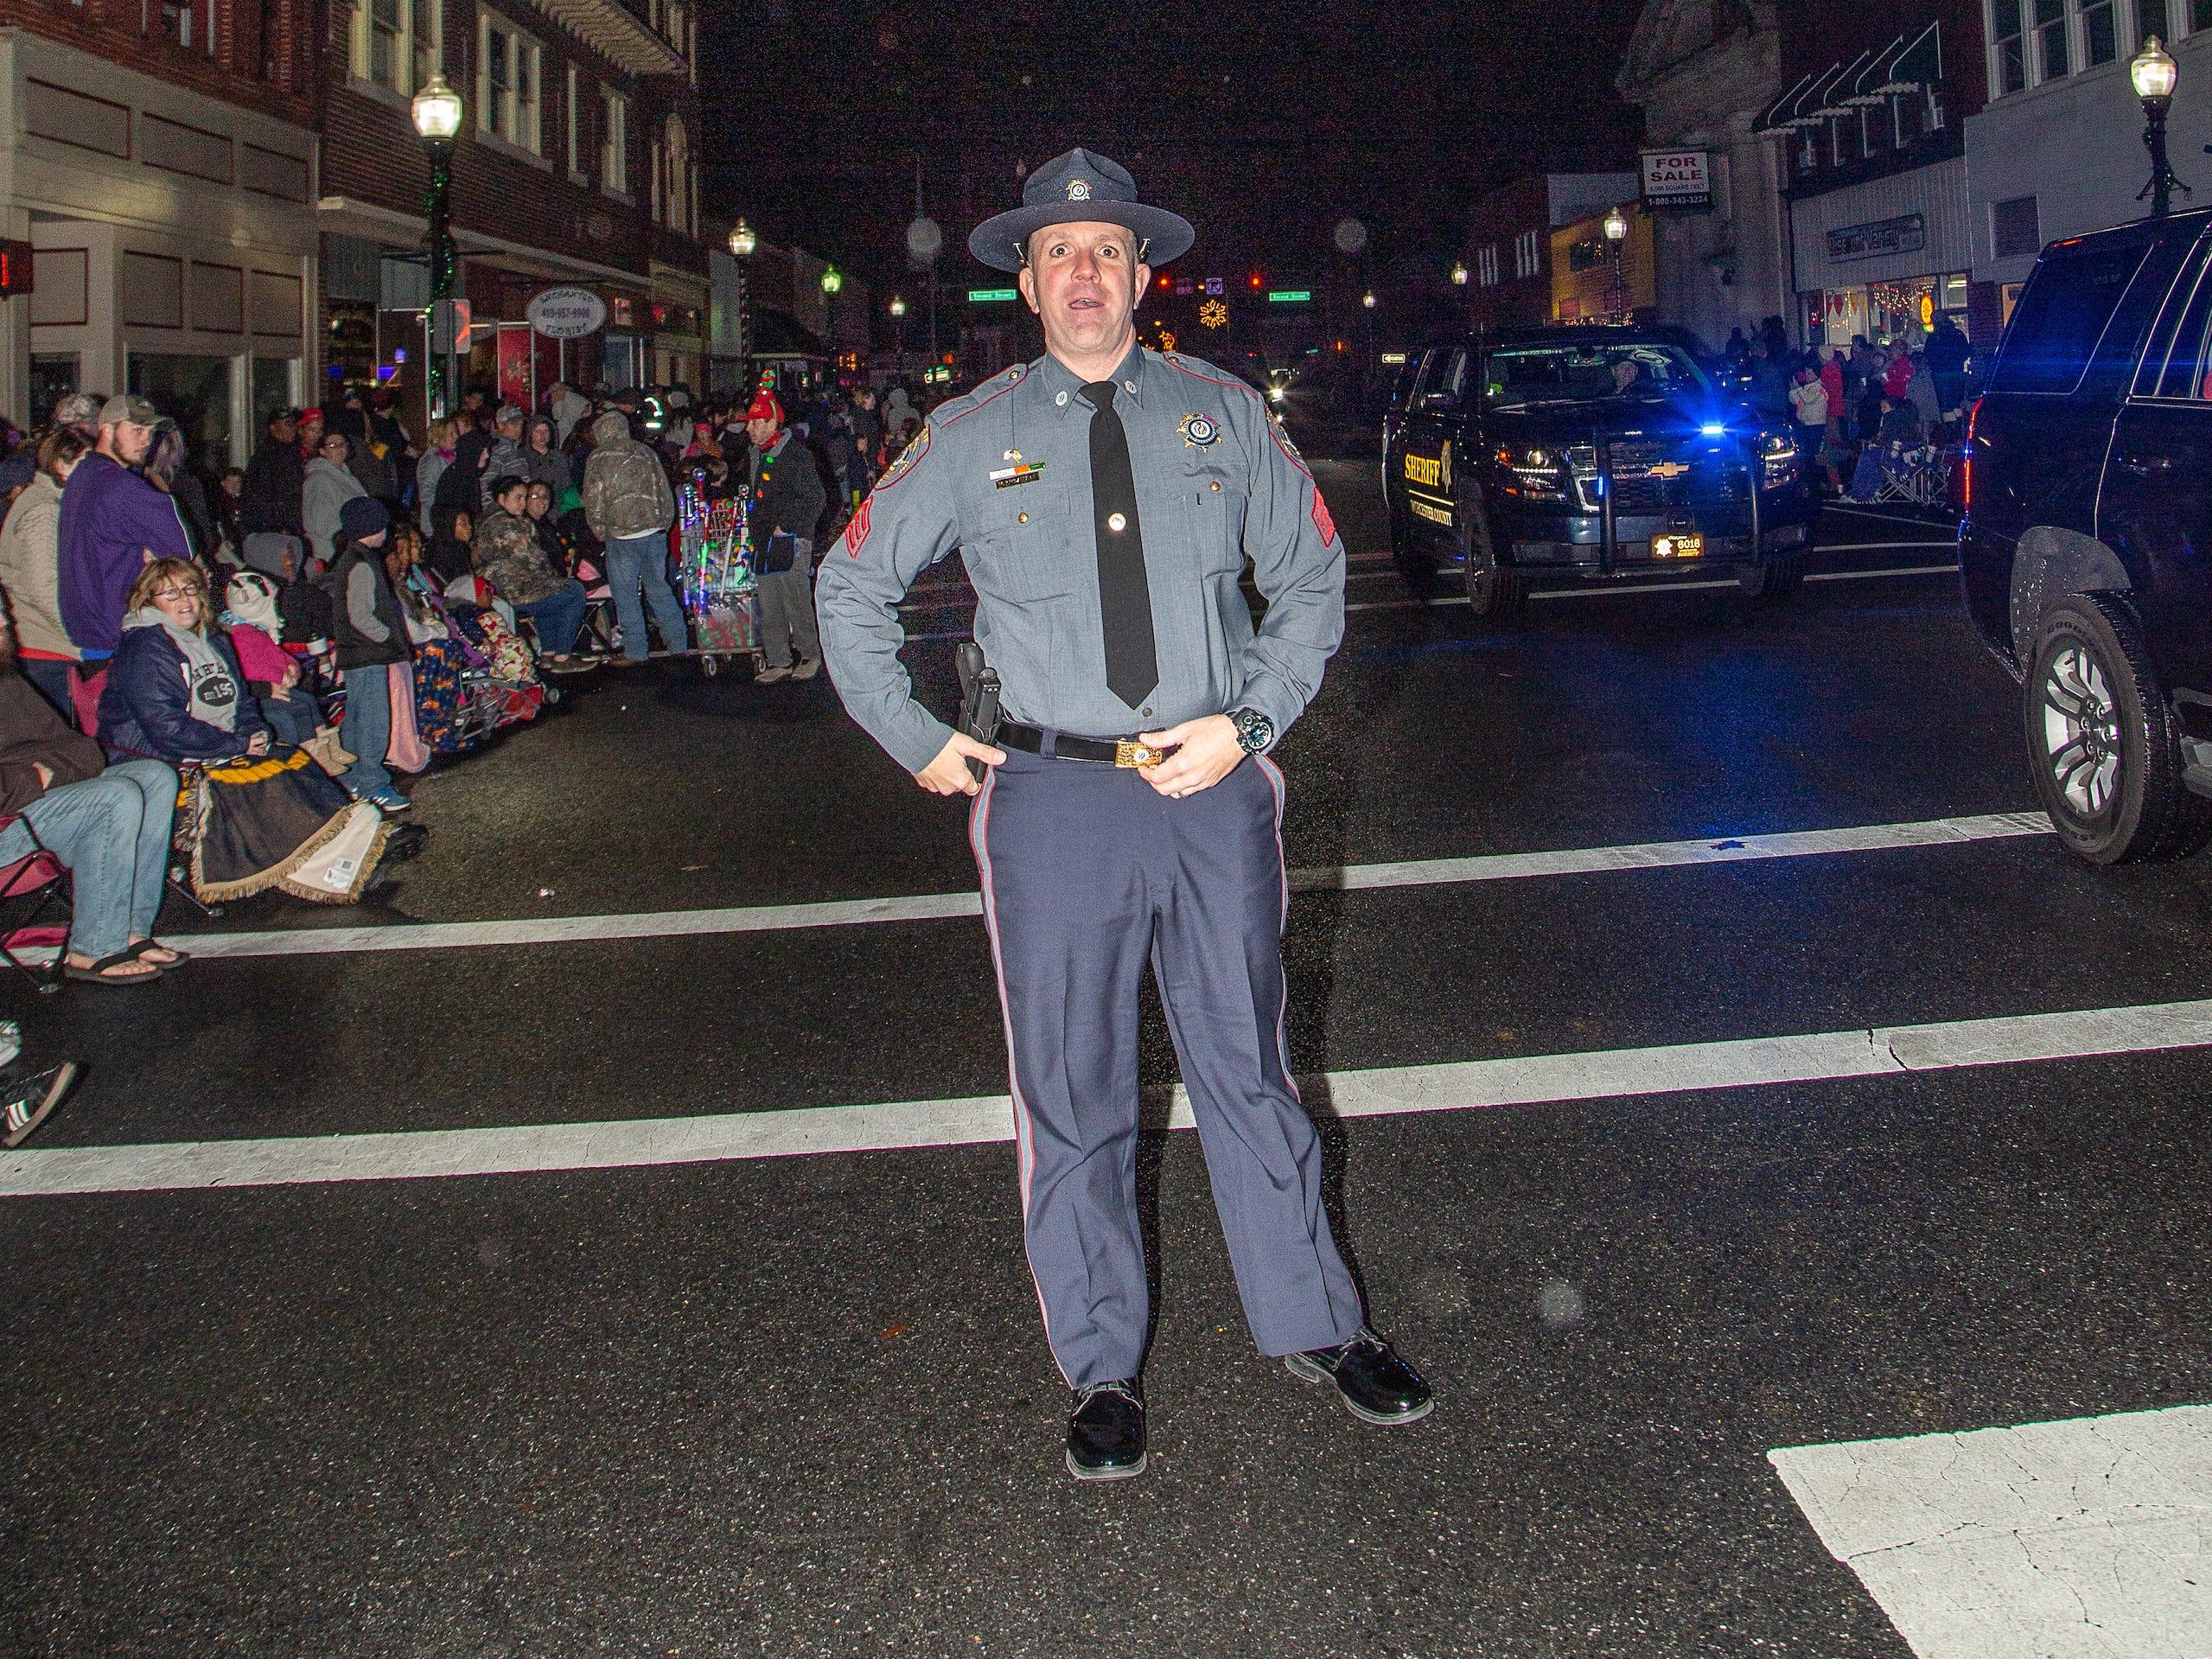 Worcester County Sheriff-elect Matt Crisafulli attends Pocomoke City's Christmas parade.